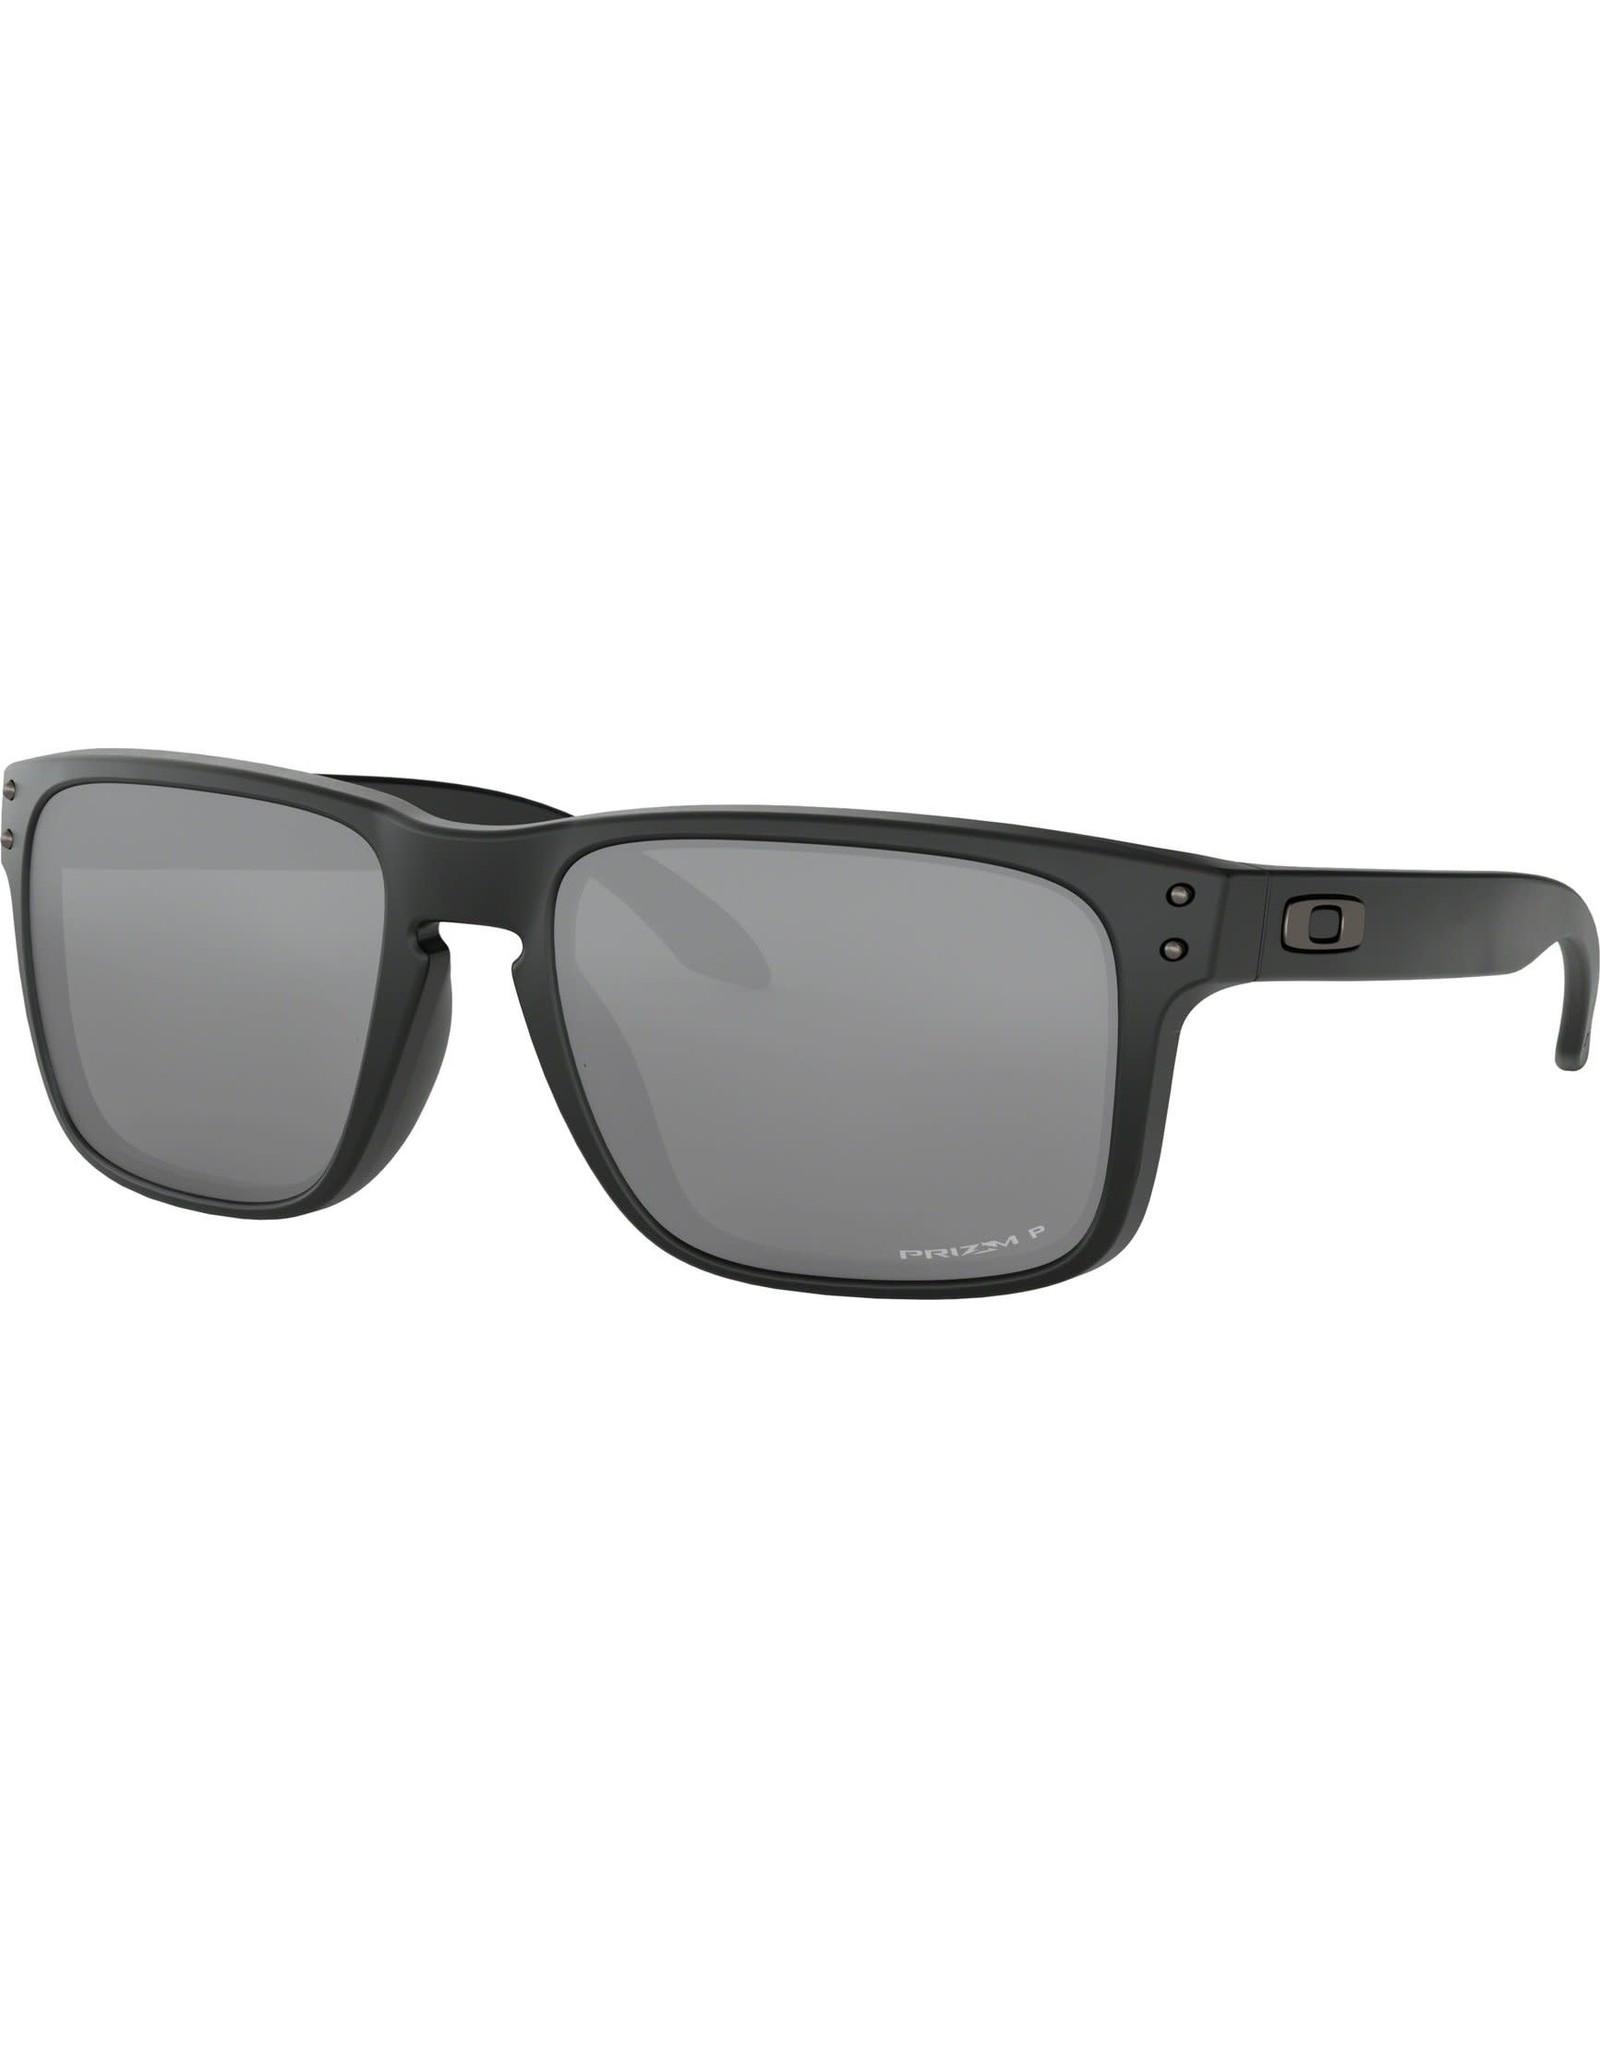 Oakley Canada Oakley - Holbrook Matte Black w/ Prizm Black Iridium Polarized